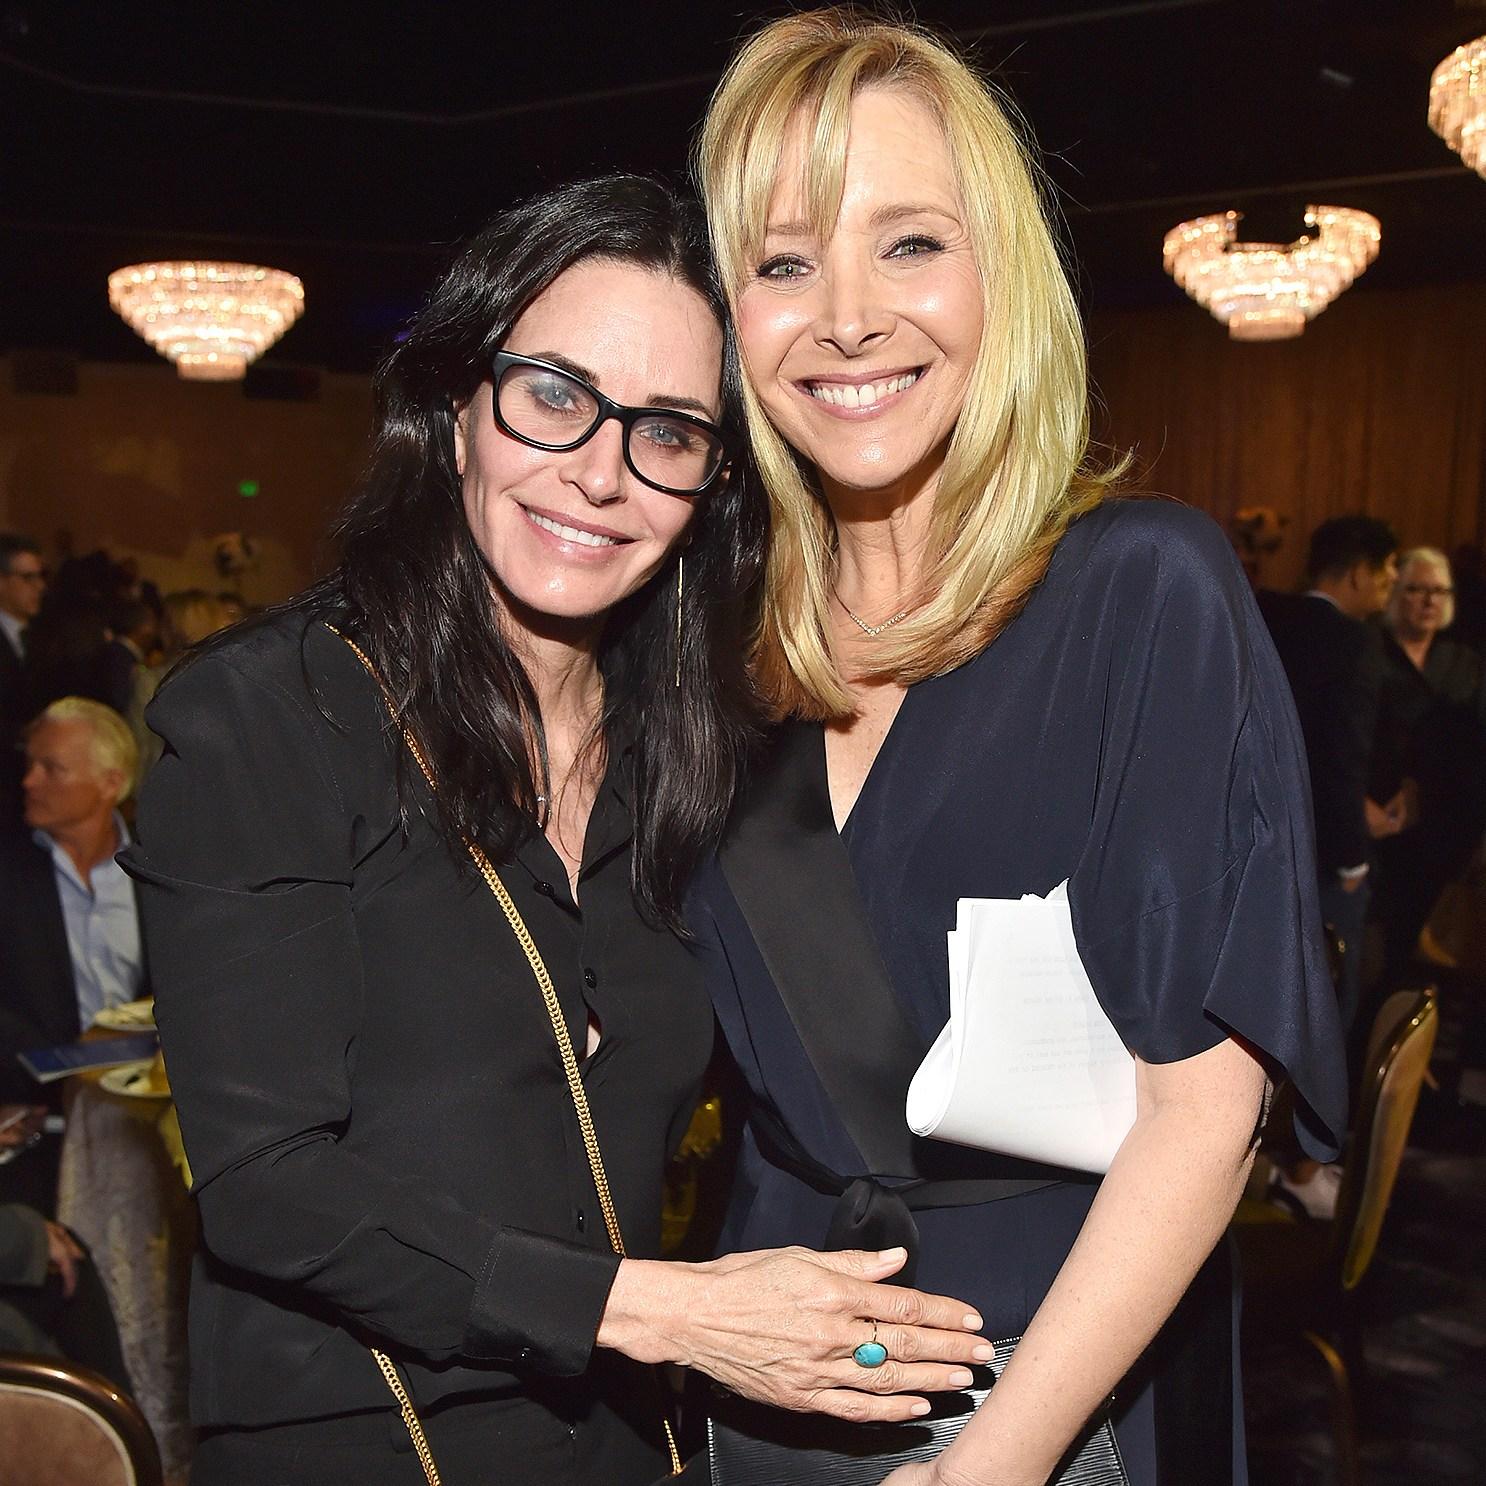 Courteney Cox, Lisa Kudrow, Burn to Remember, Friends, Group Chain, Jennifer Aniston